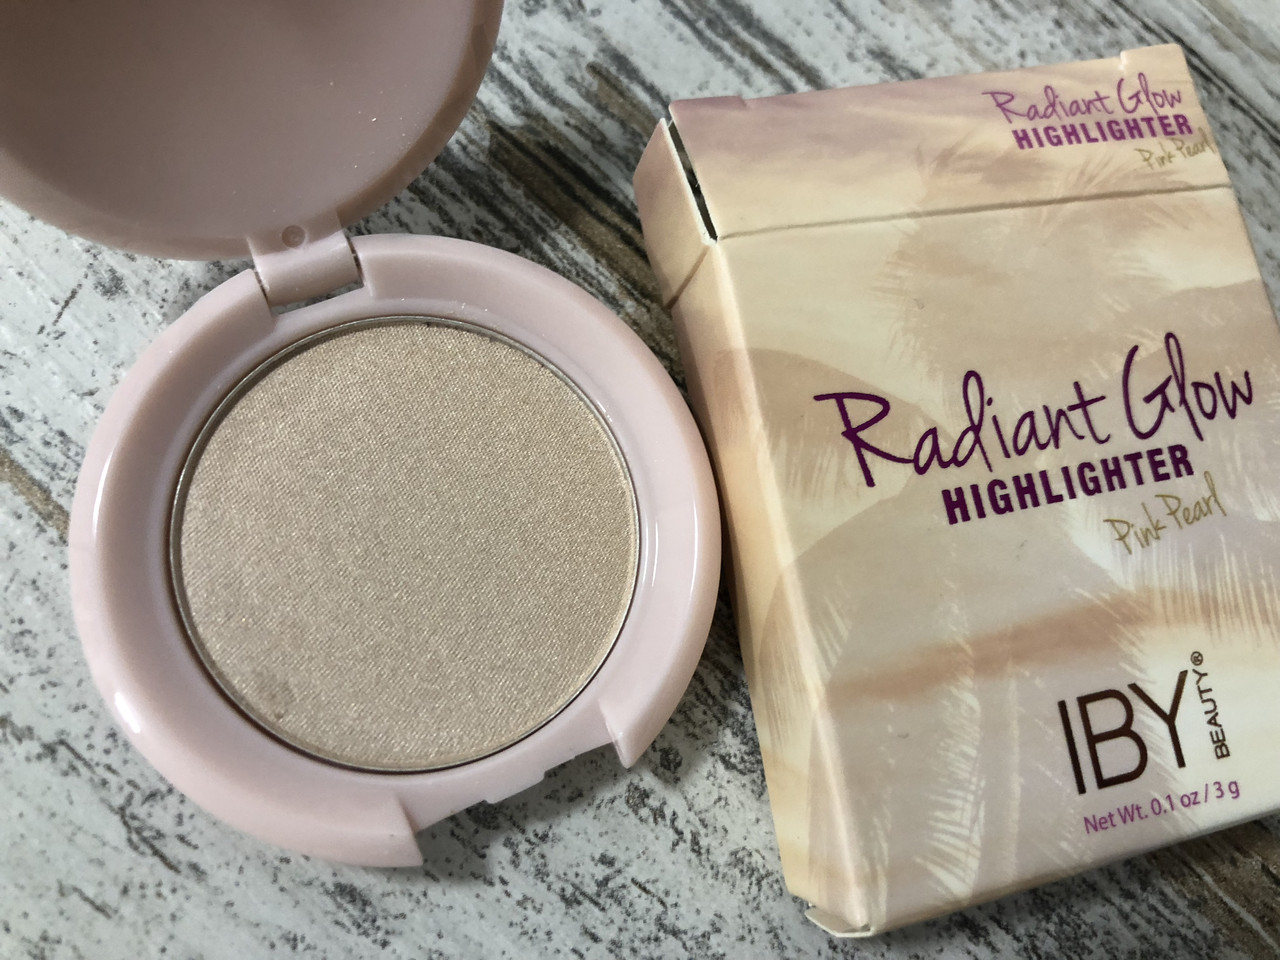 Розово-жемчужный хайлайтер для лица IBY BEAUTY Radiant Glow Highlighter